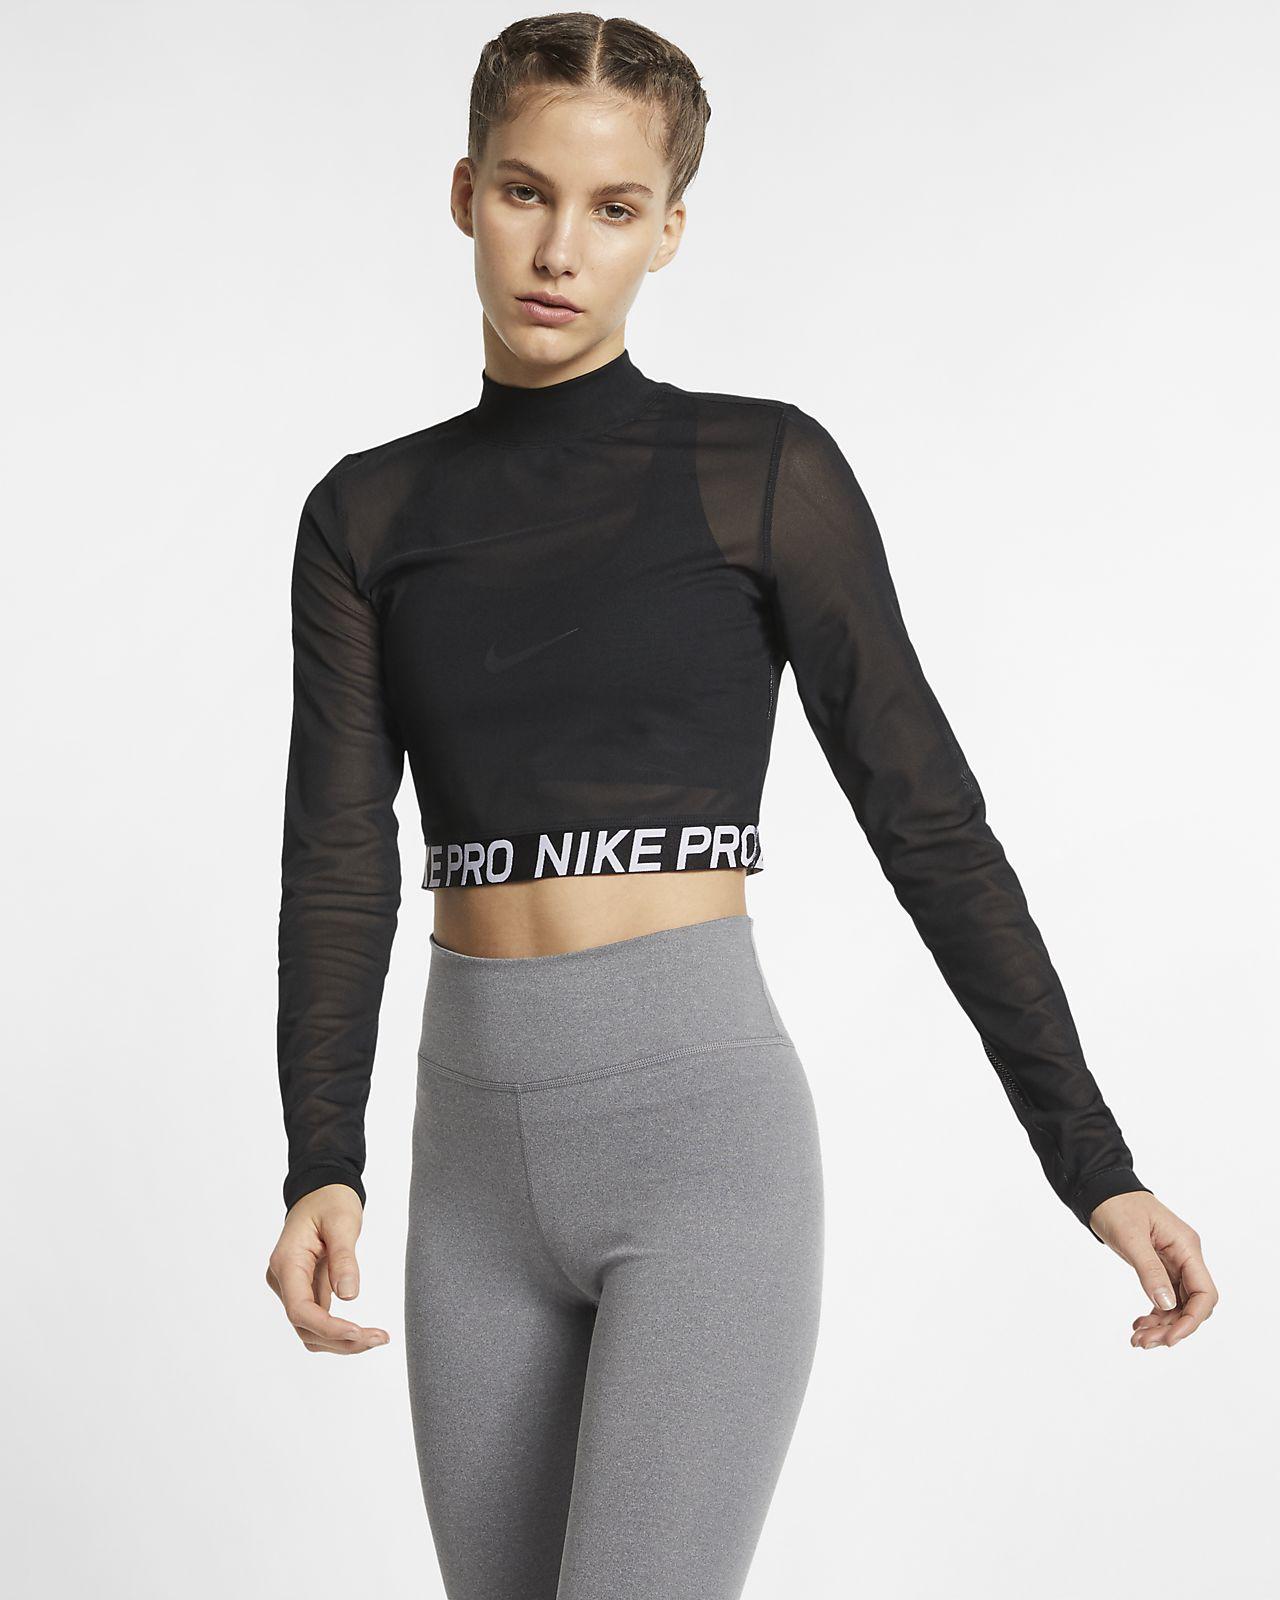 749496db12feb Prenda para la parte superior de manga larga para mujer Nike Pro ...